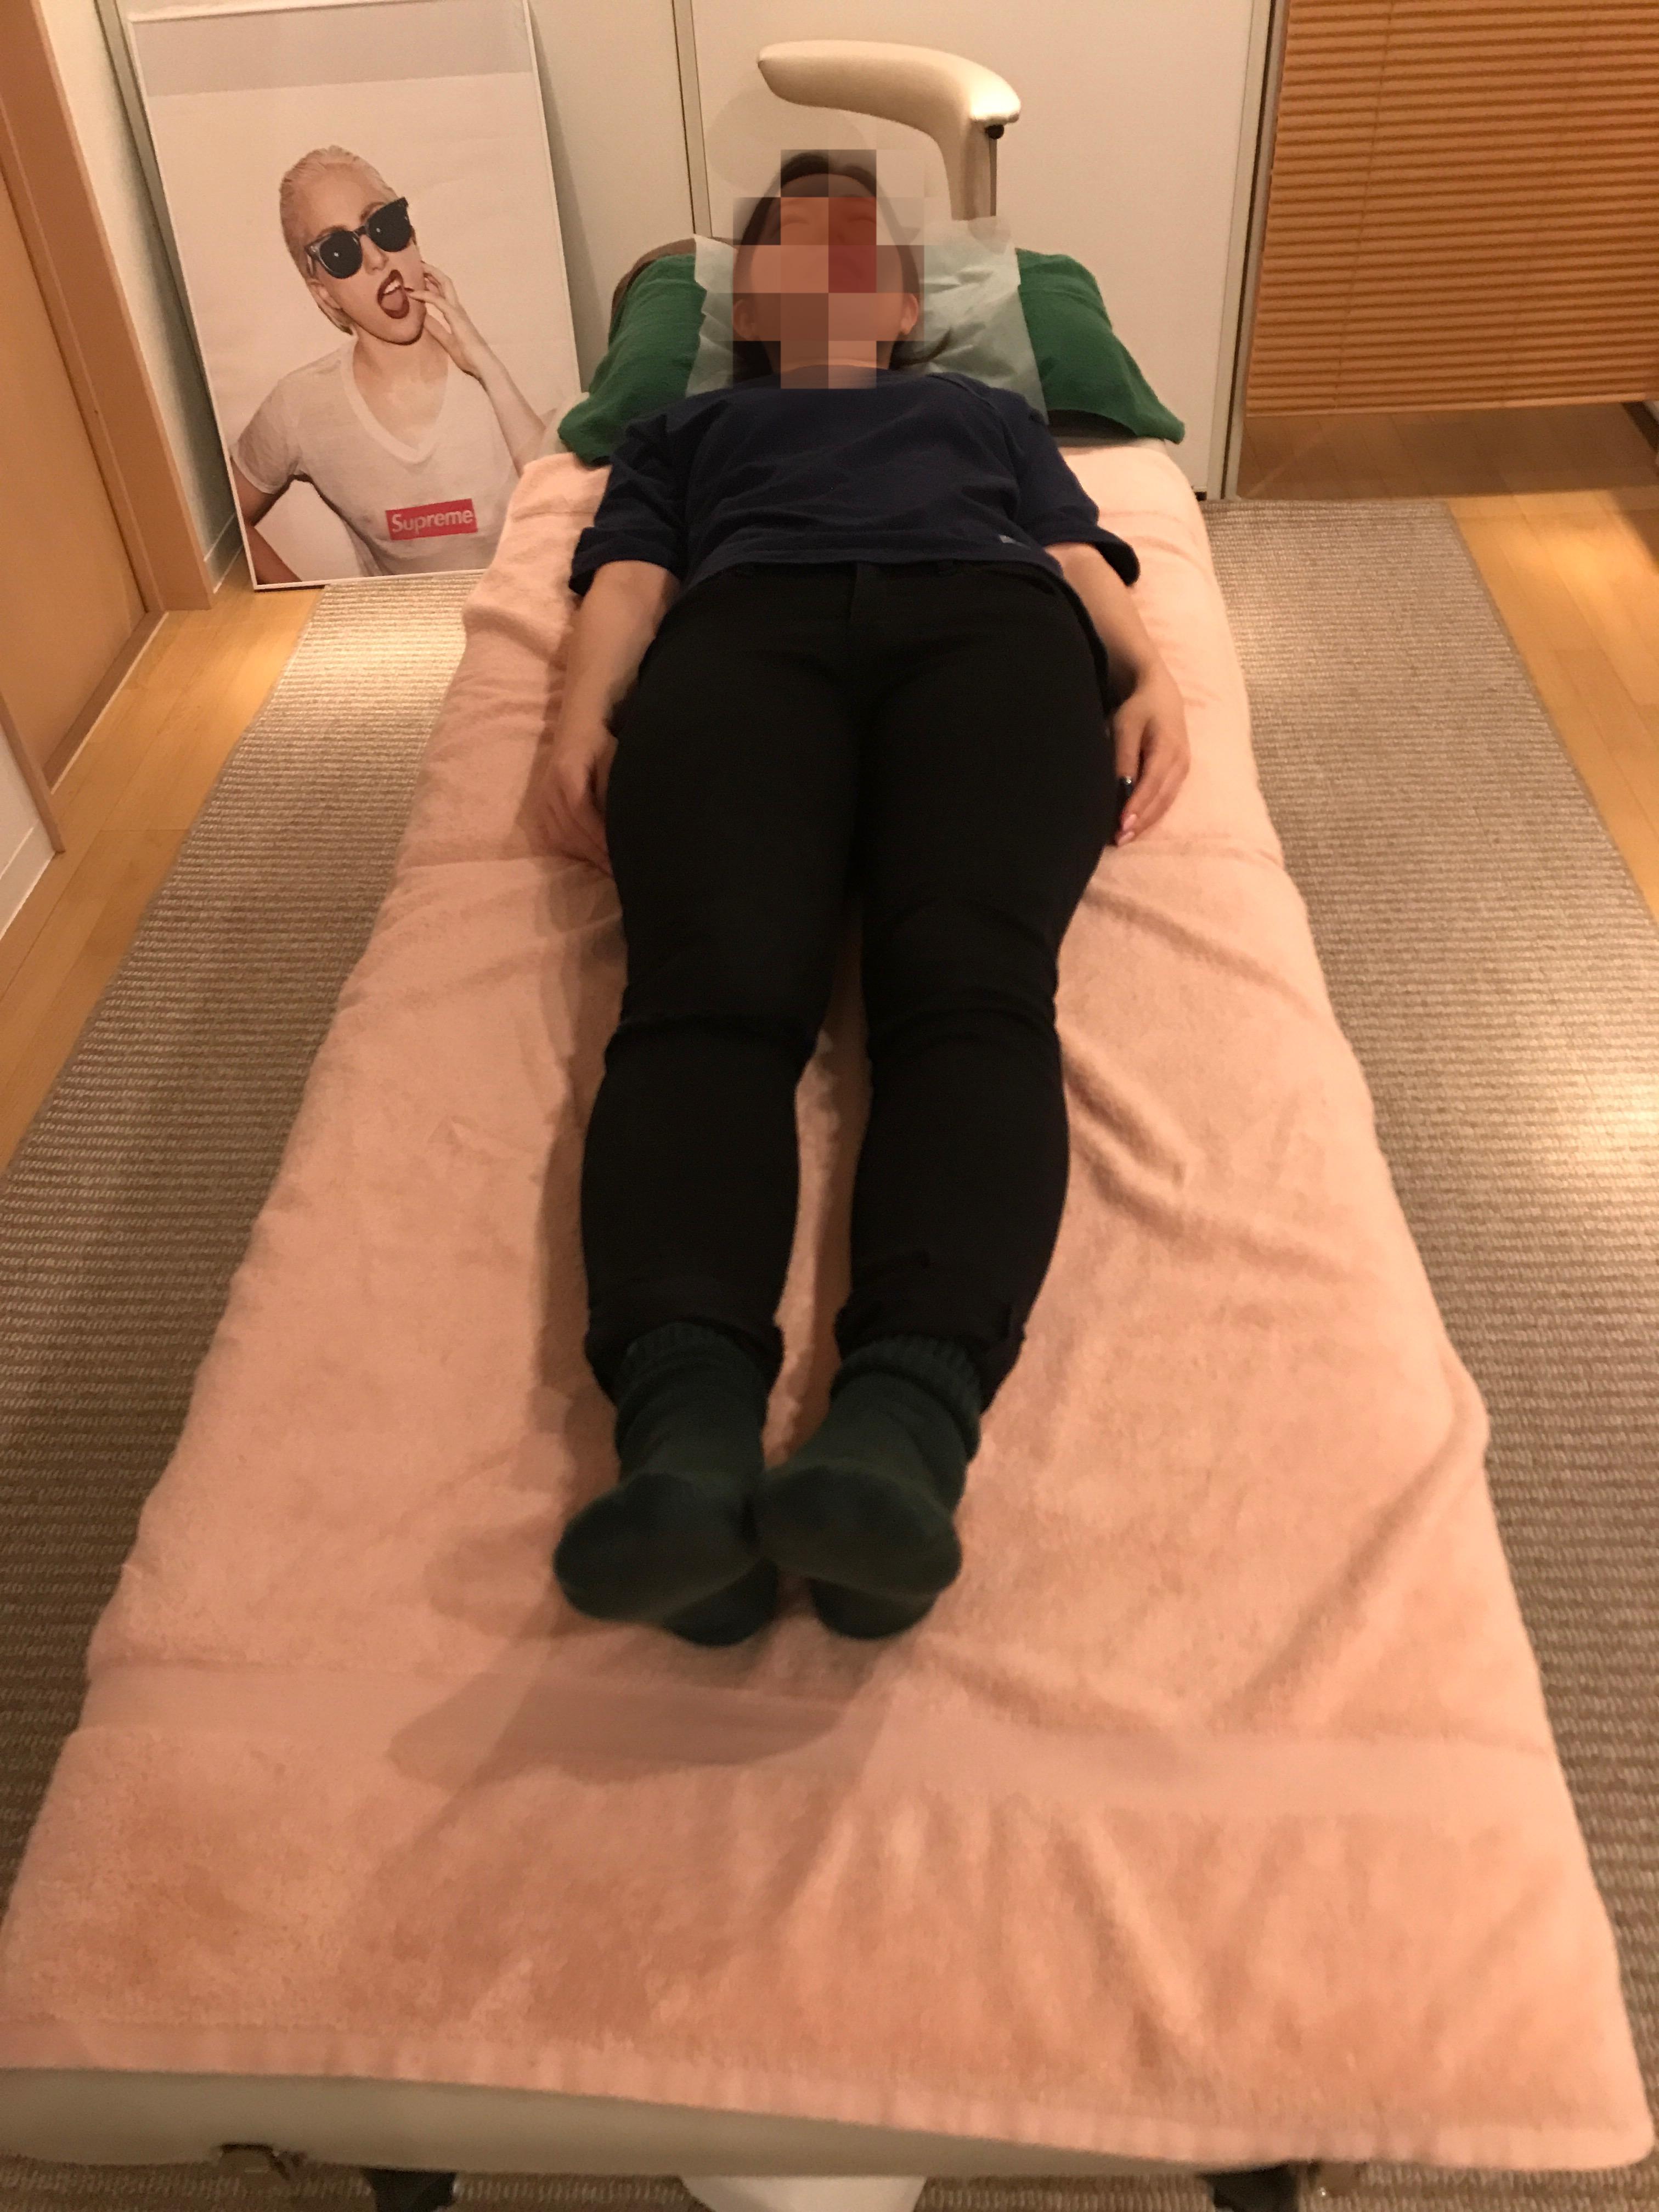 突発性難聴と腰痛